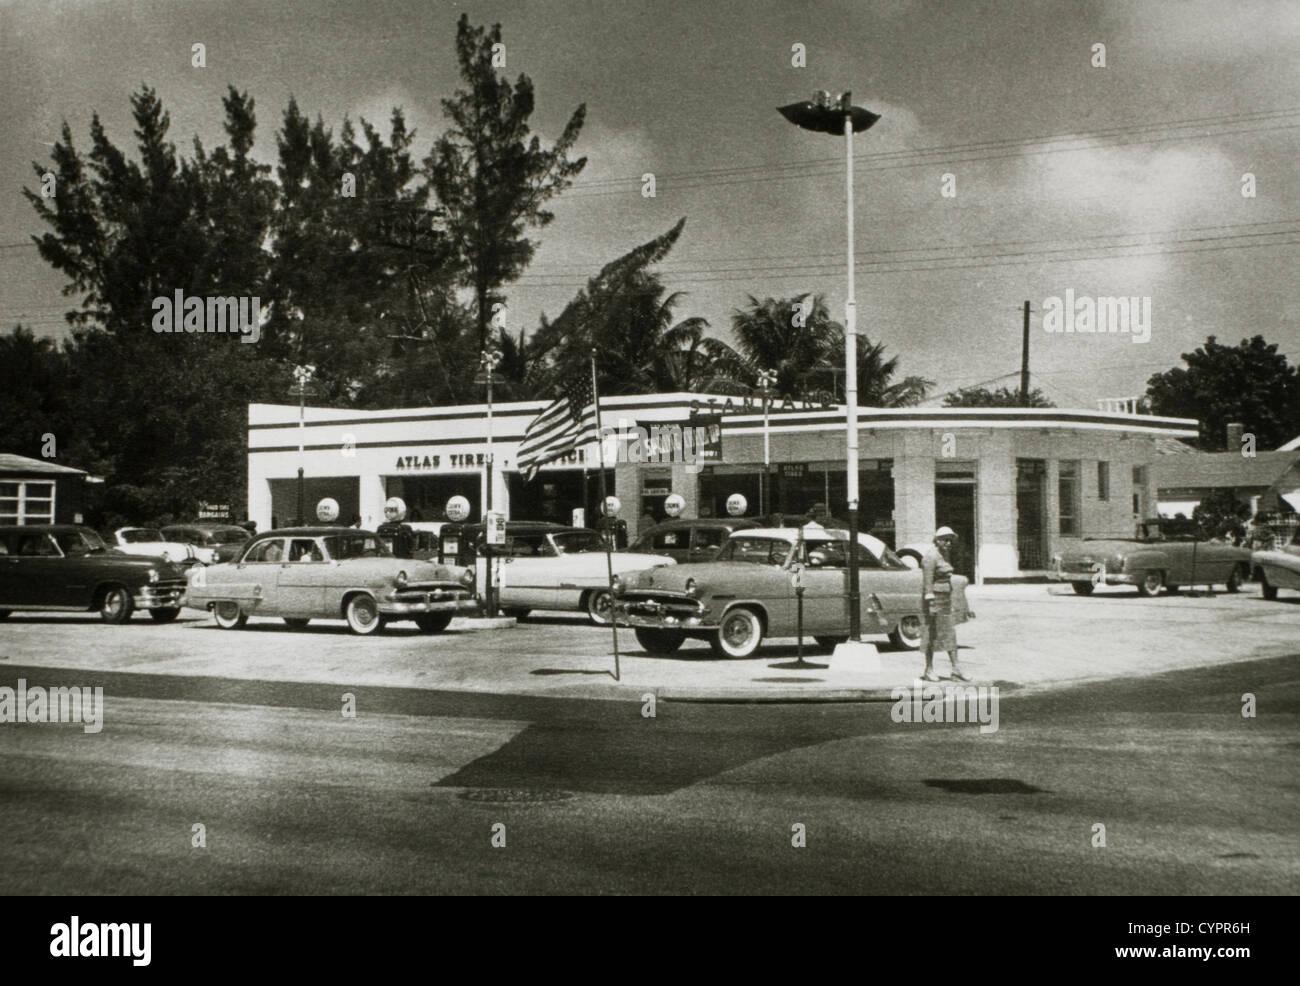 Gasoline Station, Madison, Wisconsin, USA, Circa 1950 - Stock Image